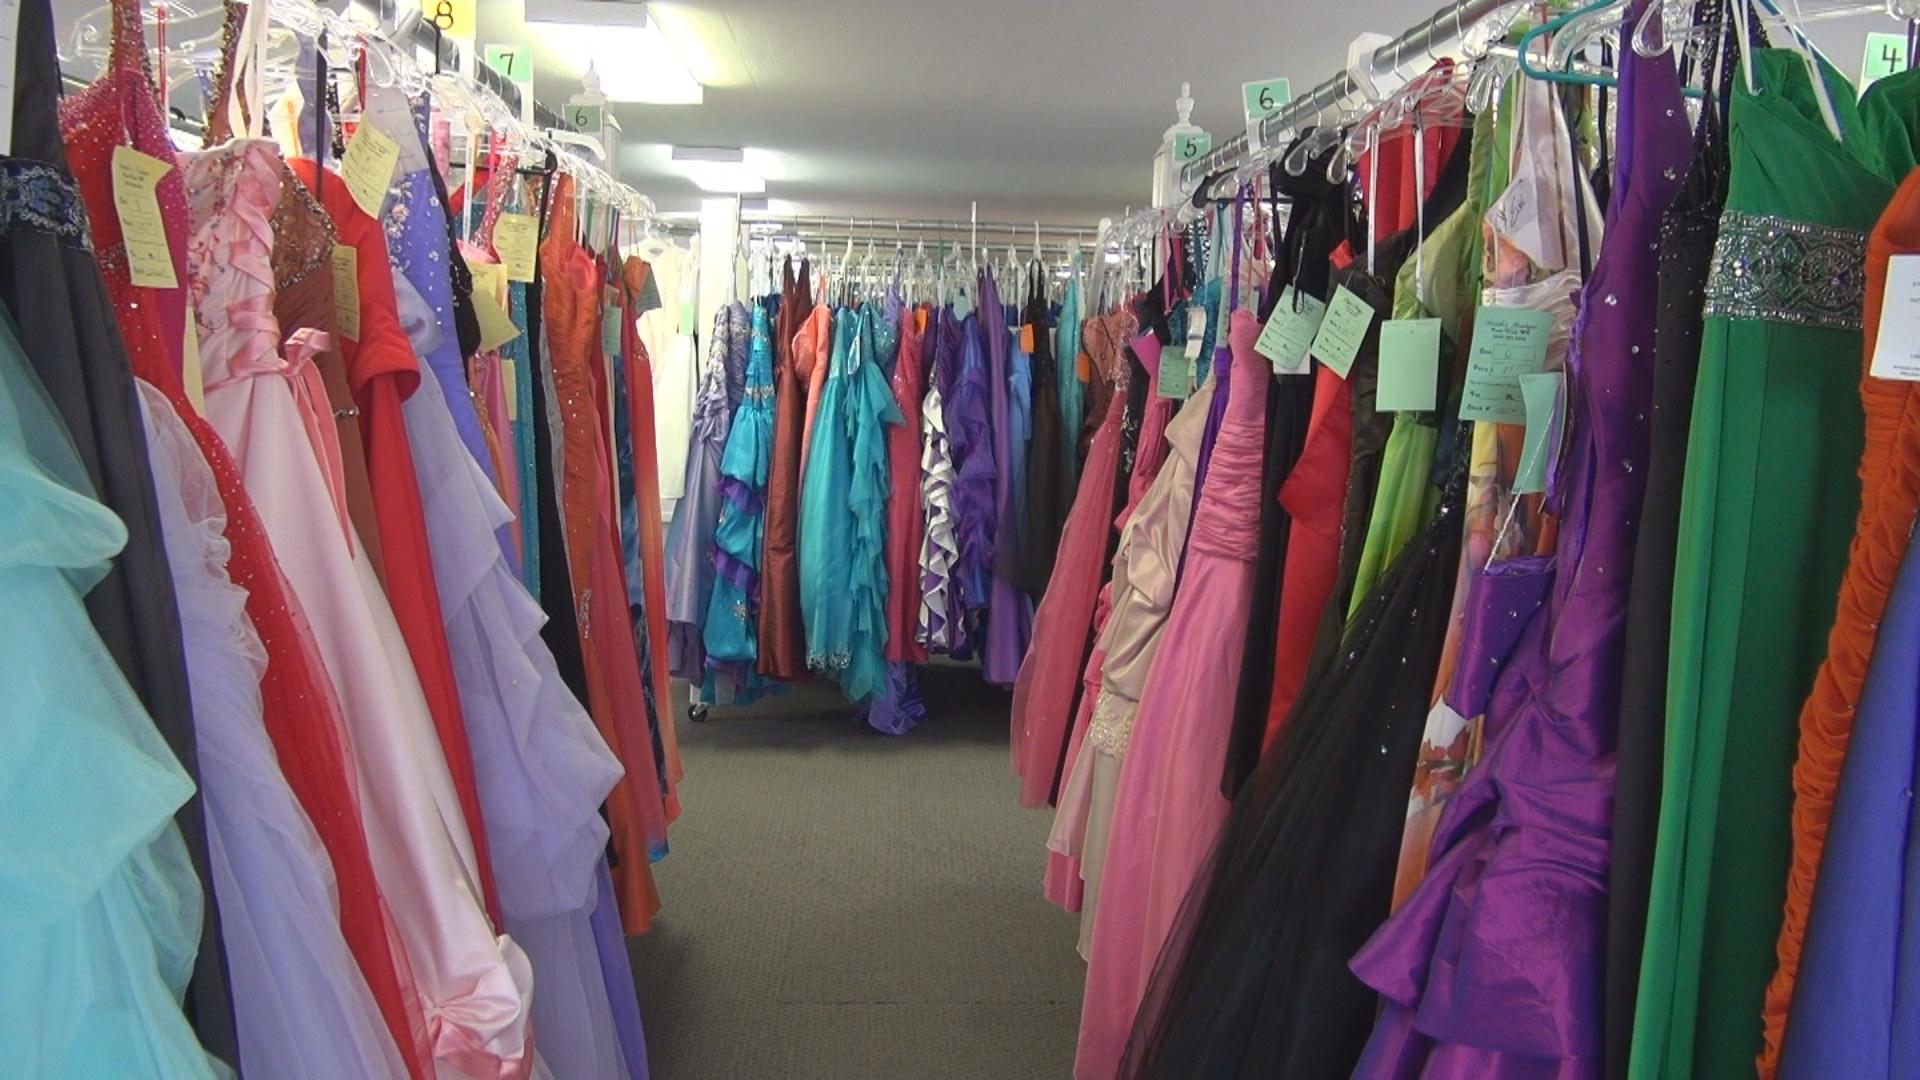 Dinah's Boutique Offers Rental Prom Dresses - WBOY - Clarksburg ...